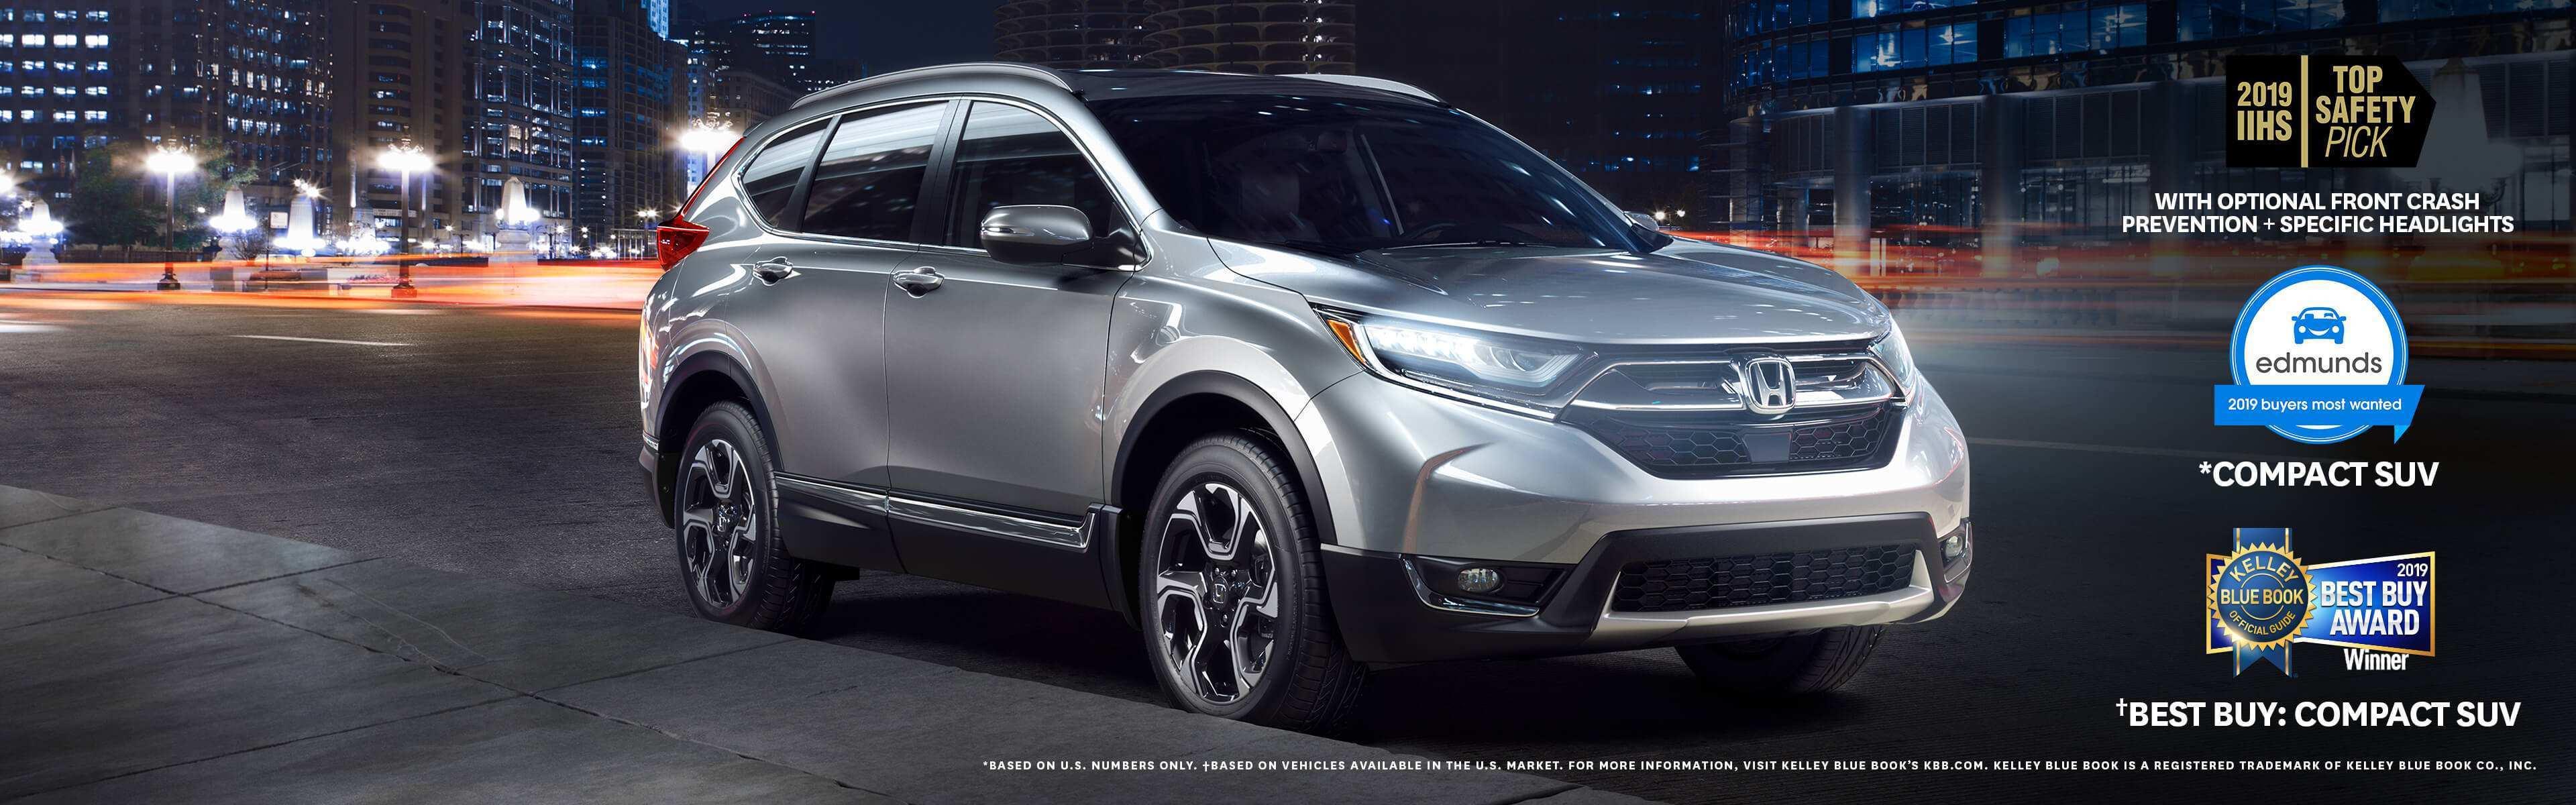 31 The Toyota 2019 Crv Price Ratings by Toyota 2019 Crv Price